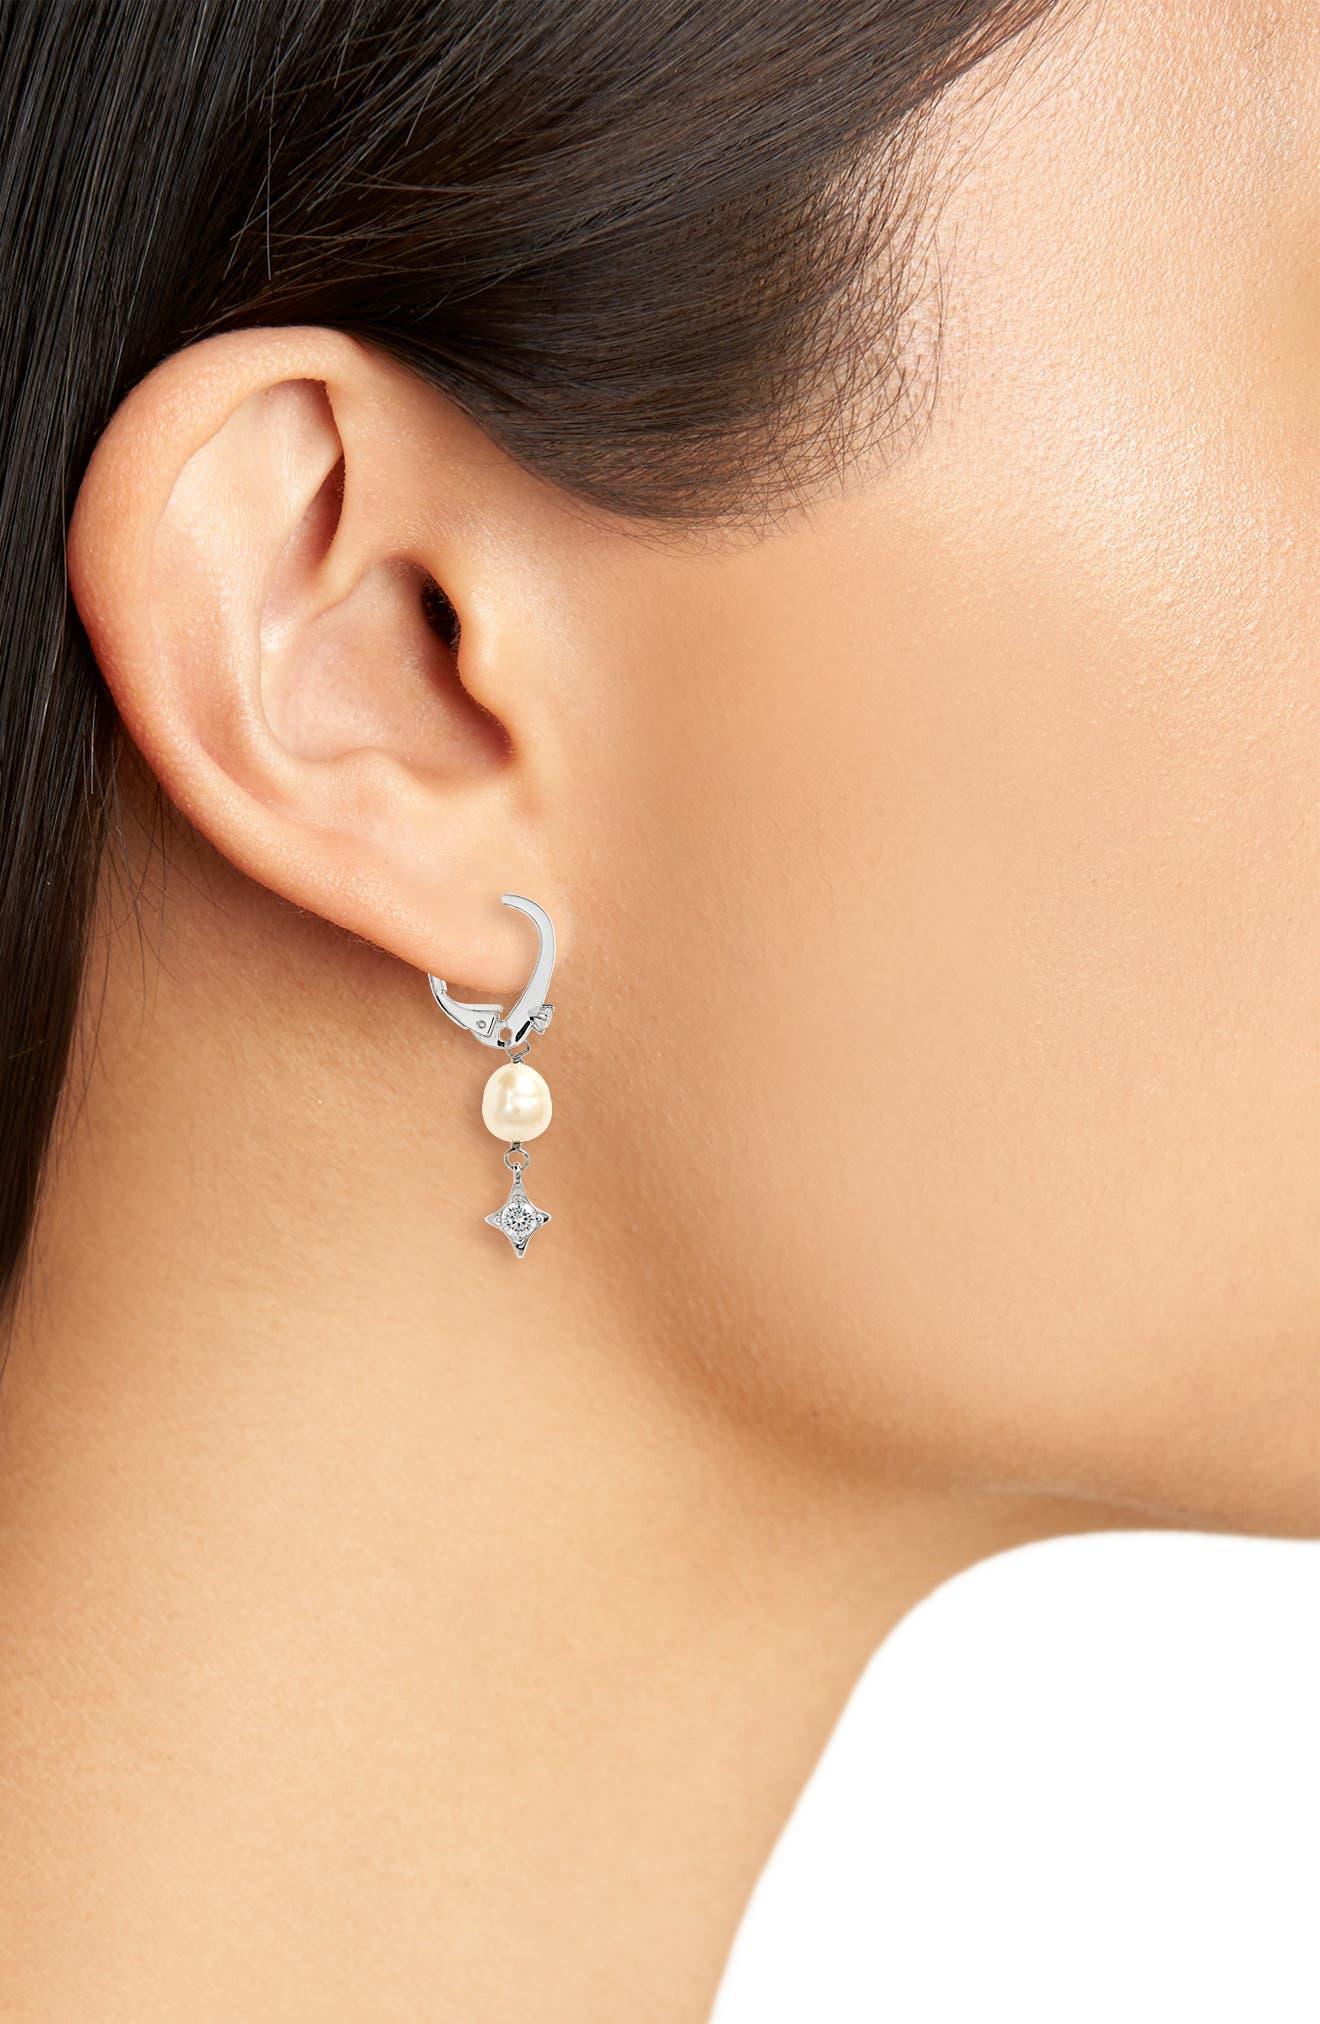 Freshwater Pearl Drop Earrings,                             Alternate thumbnail 2, color,                             Silver/ White Pearl